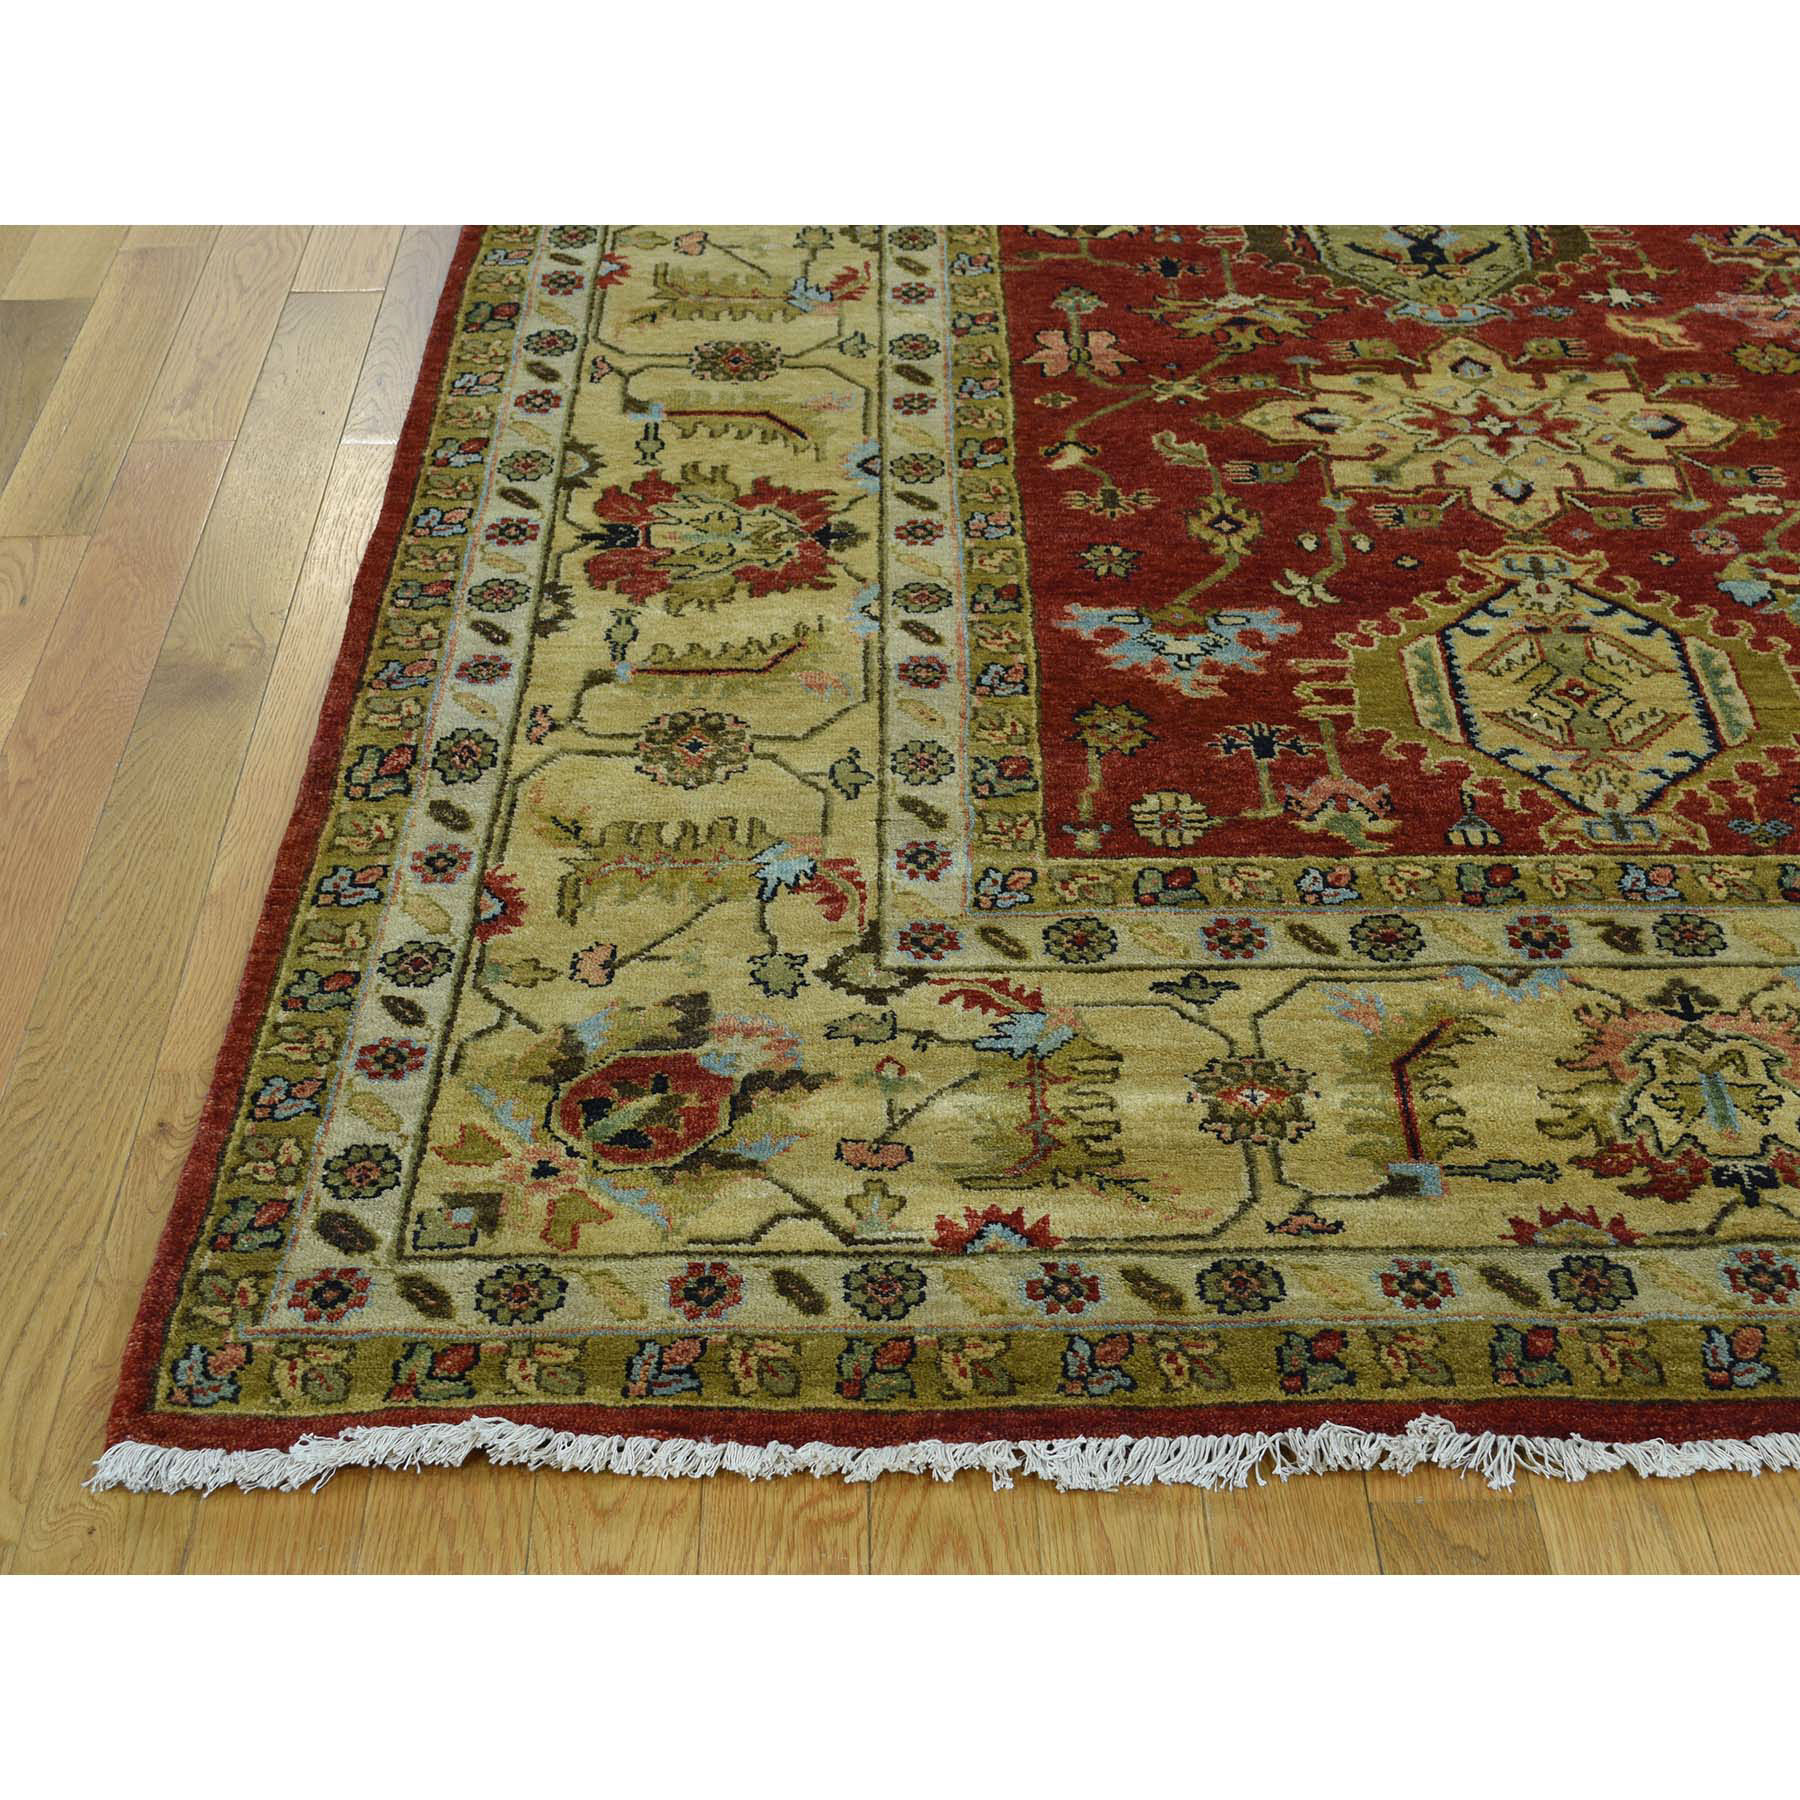 9-10 x 14- Hand-Knotted 100 Percent Wool Karajeh Oriental Rug